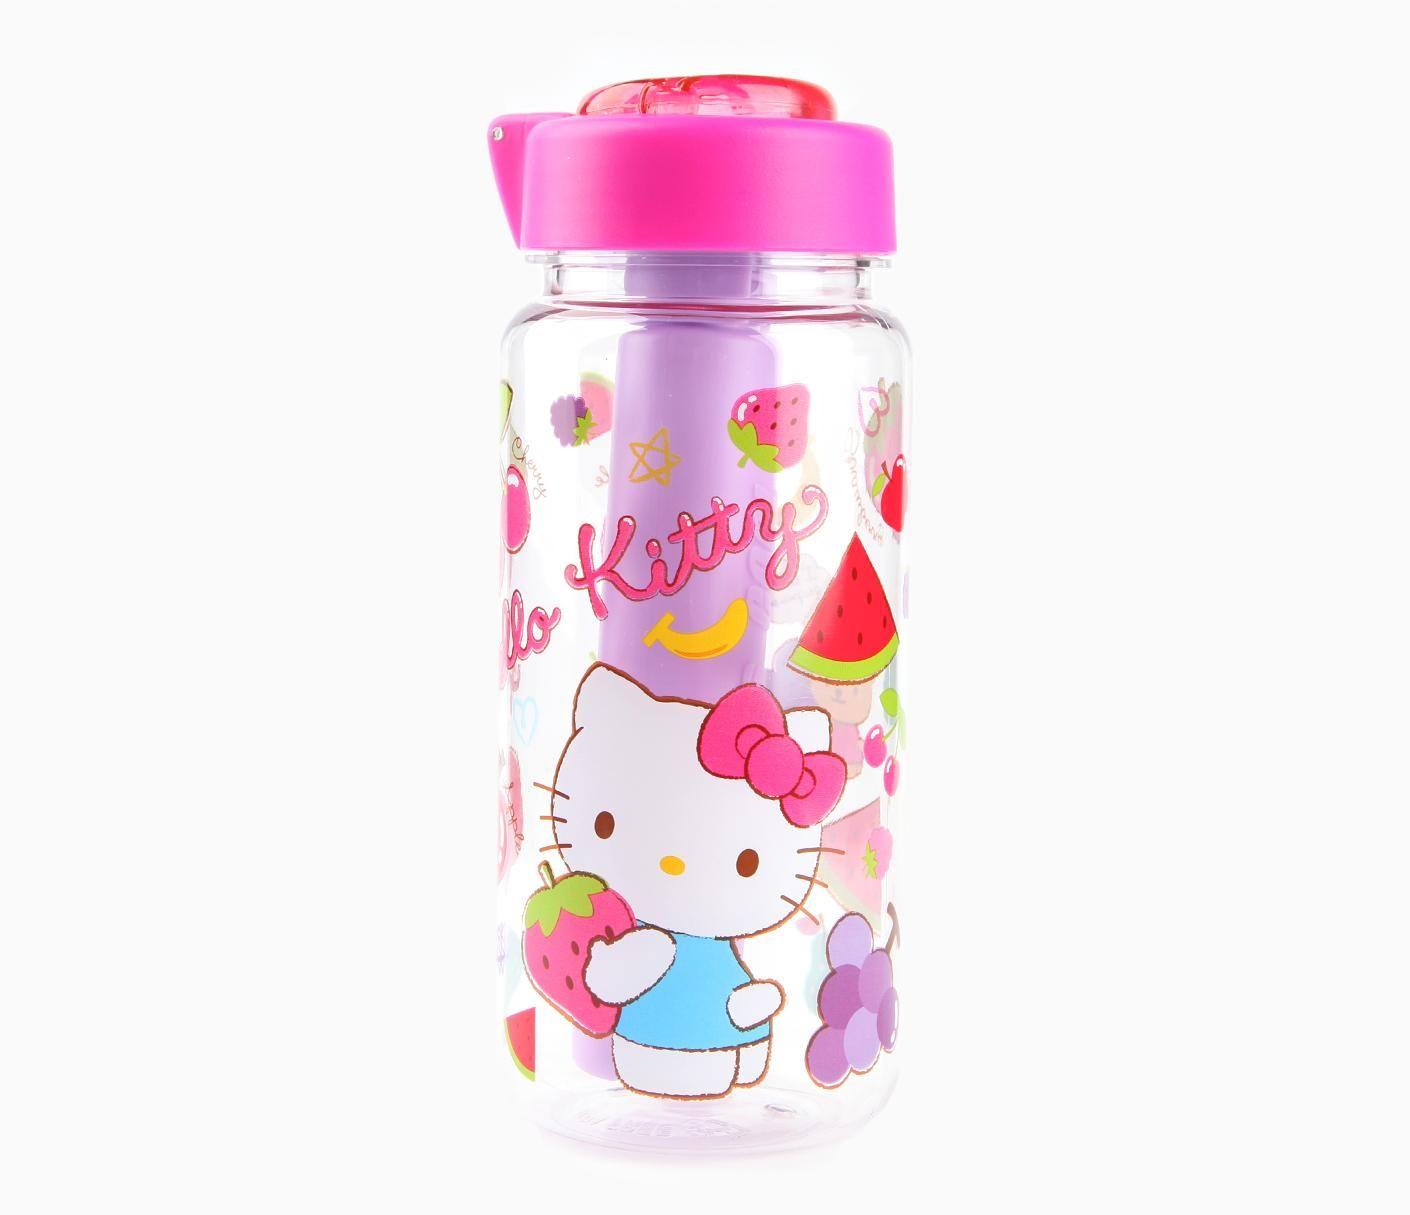 Hello Kitty Water Bottle with Ice Tube: Fruity | Sanrio Kitchen ...